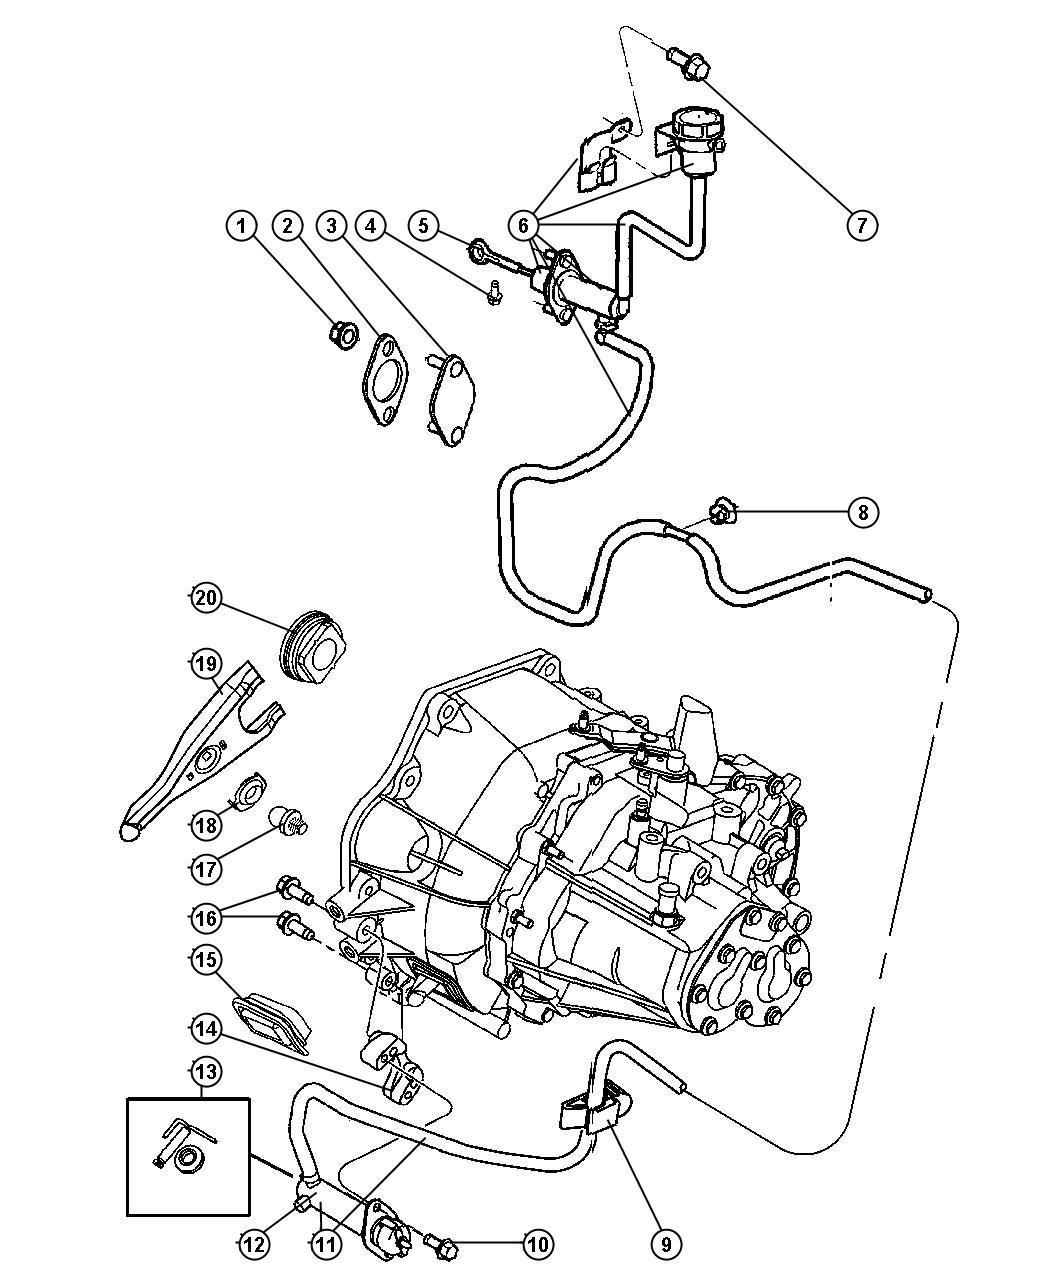 Chrysler Lhs Actuator Hydraulic Clutch